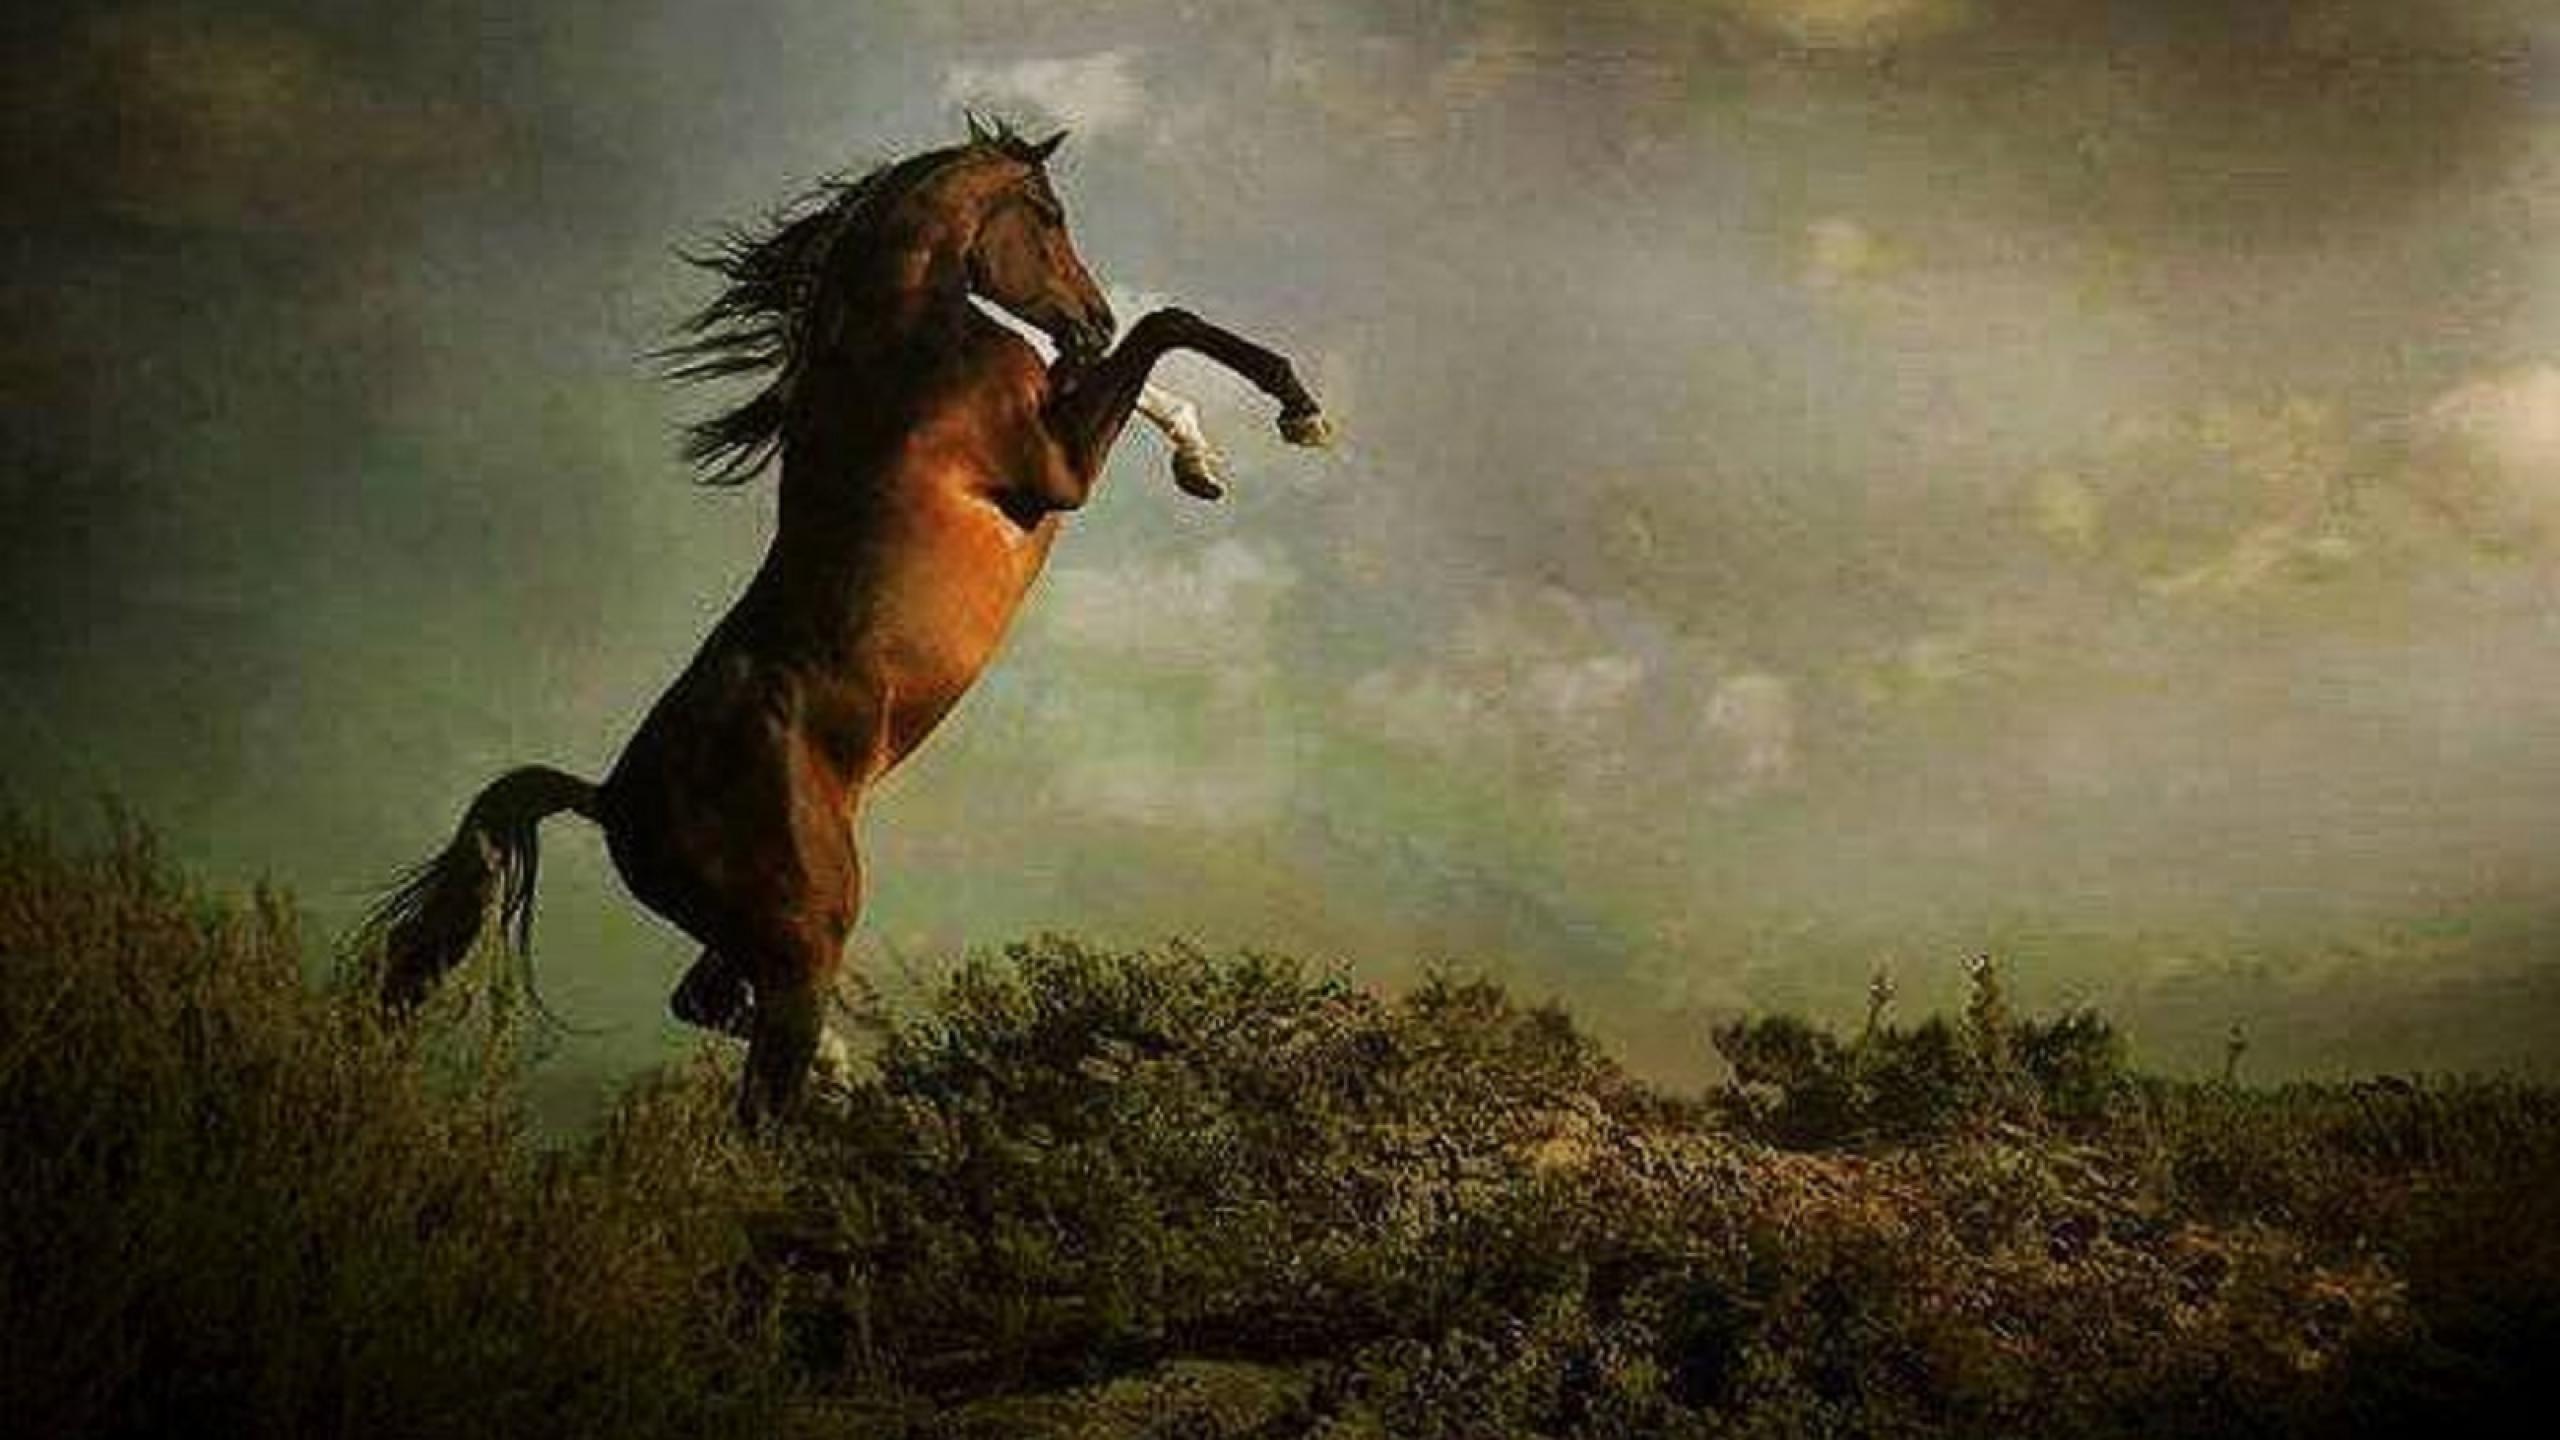 Horses Rearing Wallpapers Wallpaper Cave